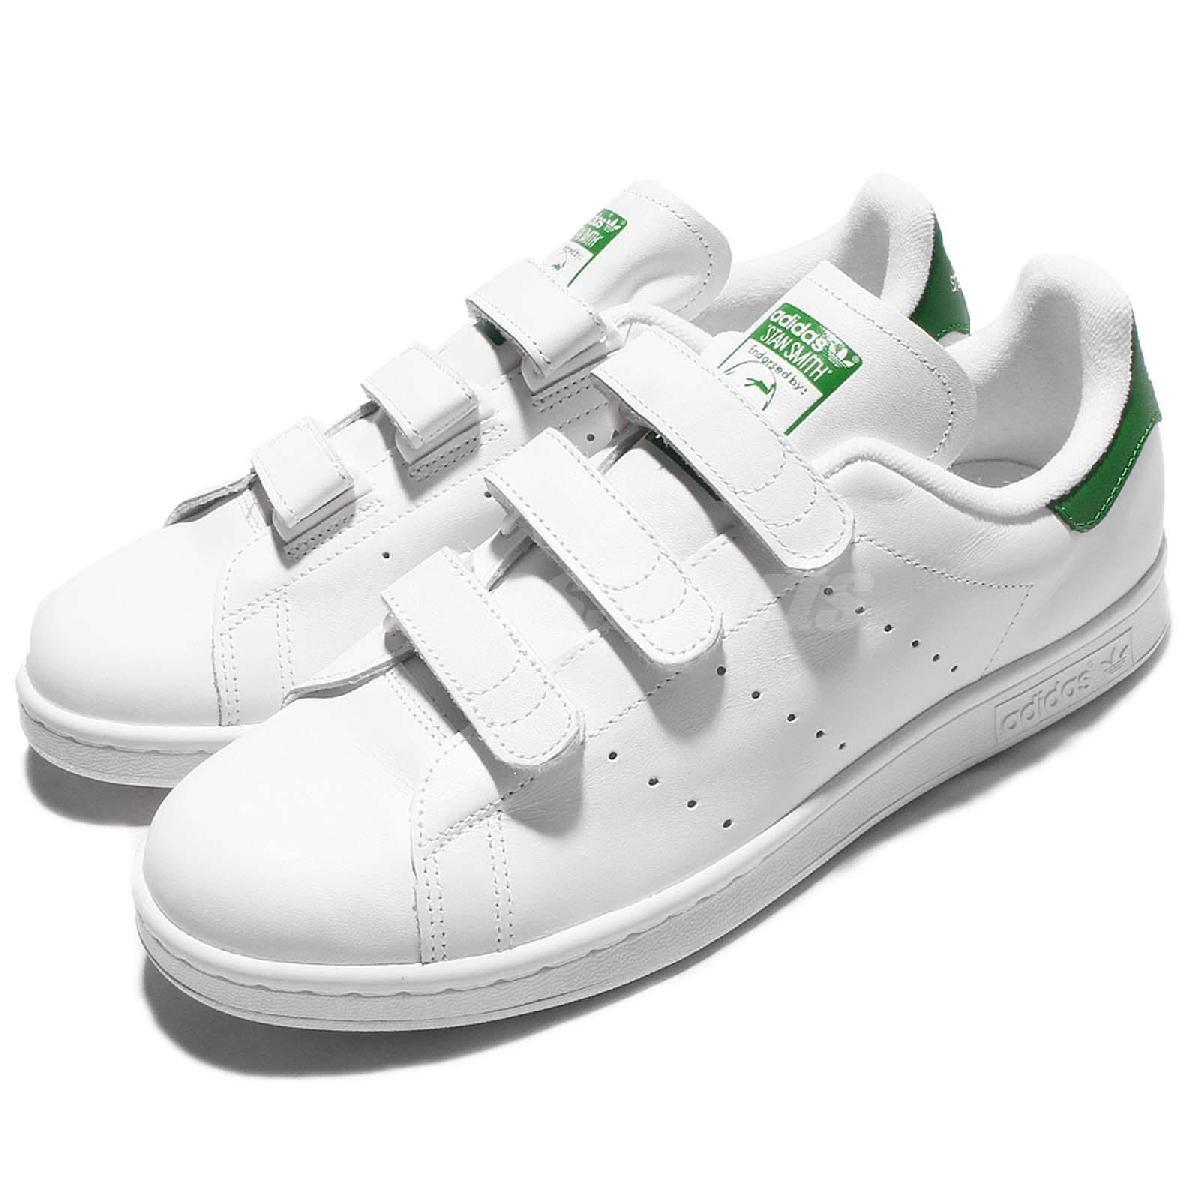 adidas休閒鞋Stan Smith CF白綠基本款魔鬼氈男鞋女鞋PUMP306 S75187